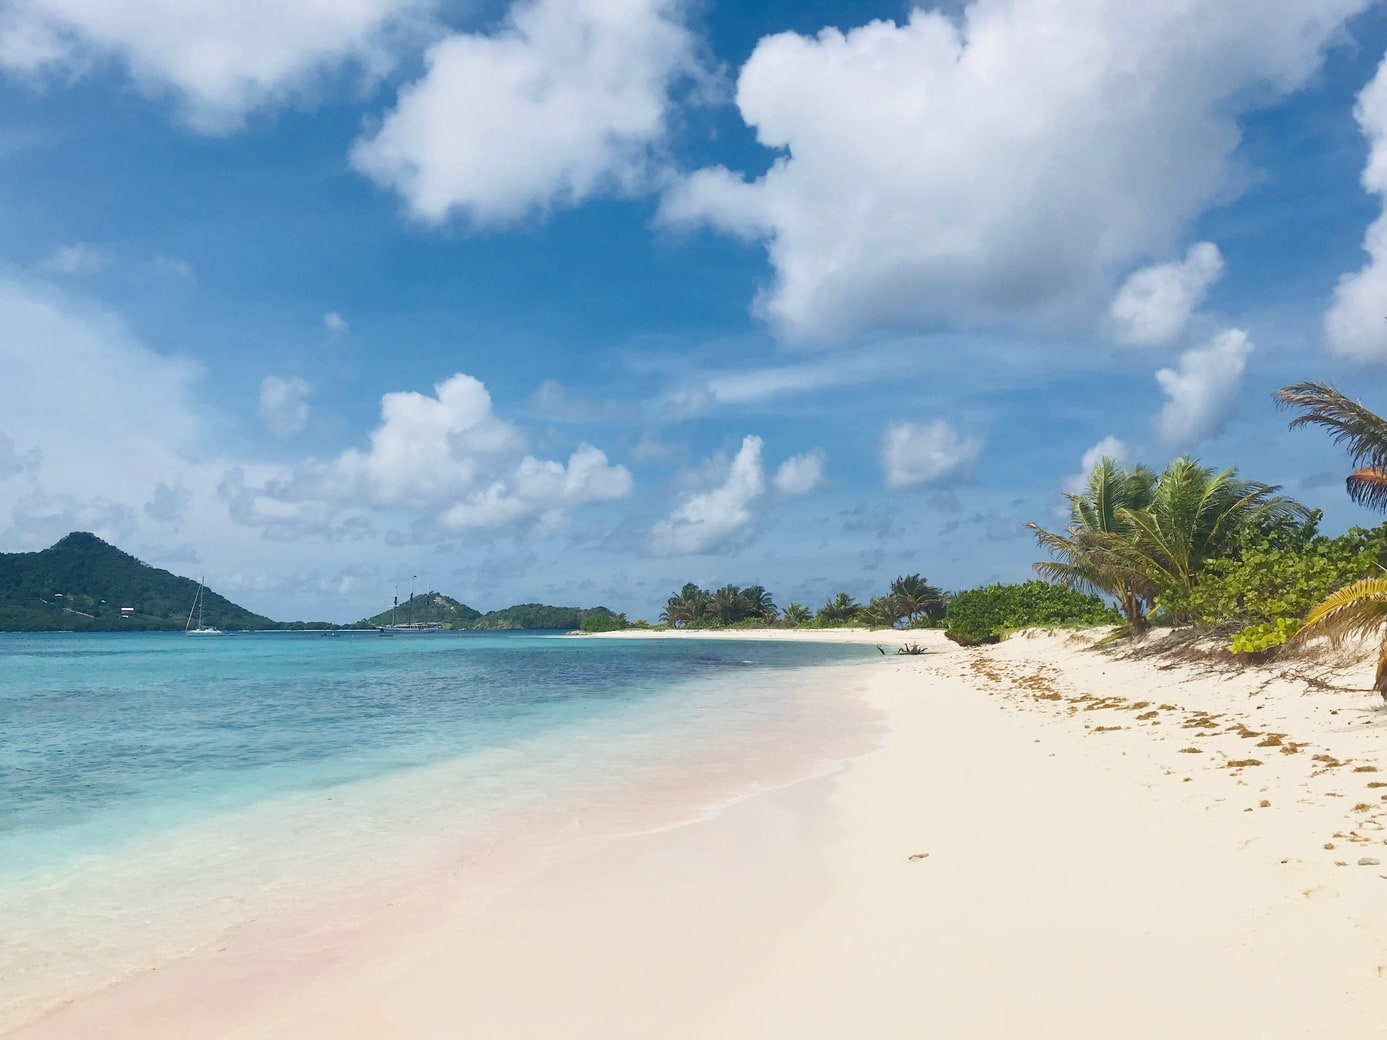 Beach Island: Visiting Sandy Island In Carriacou